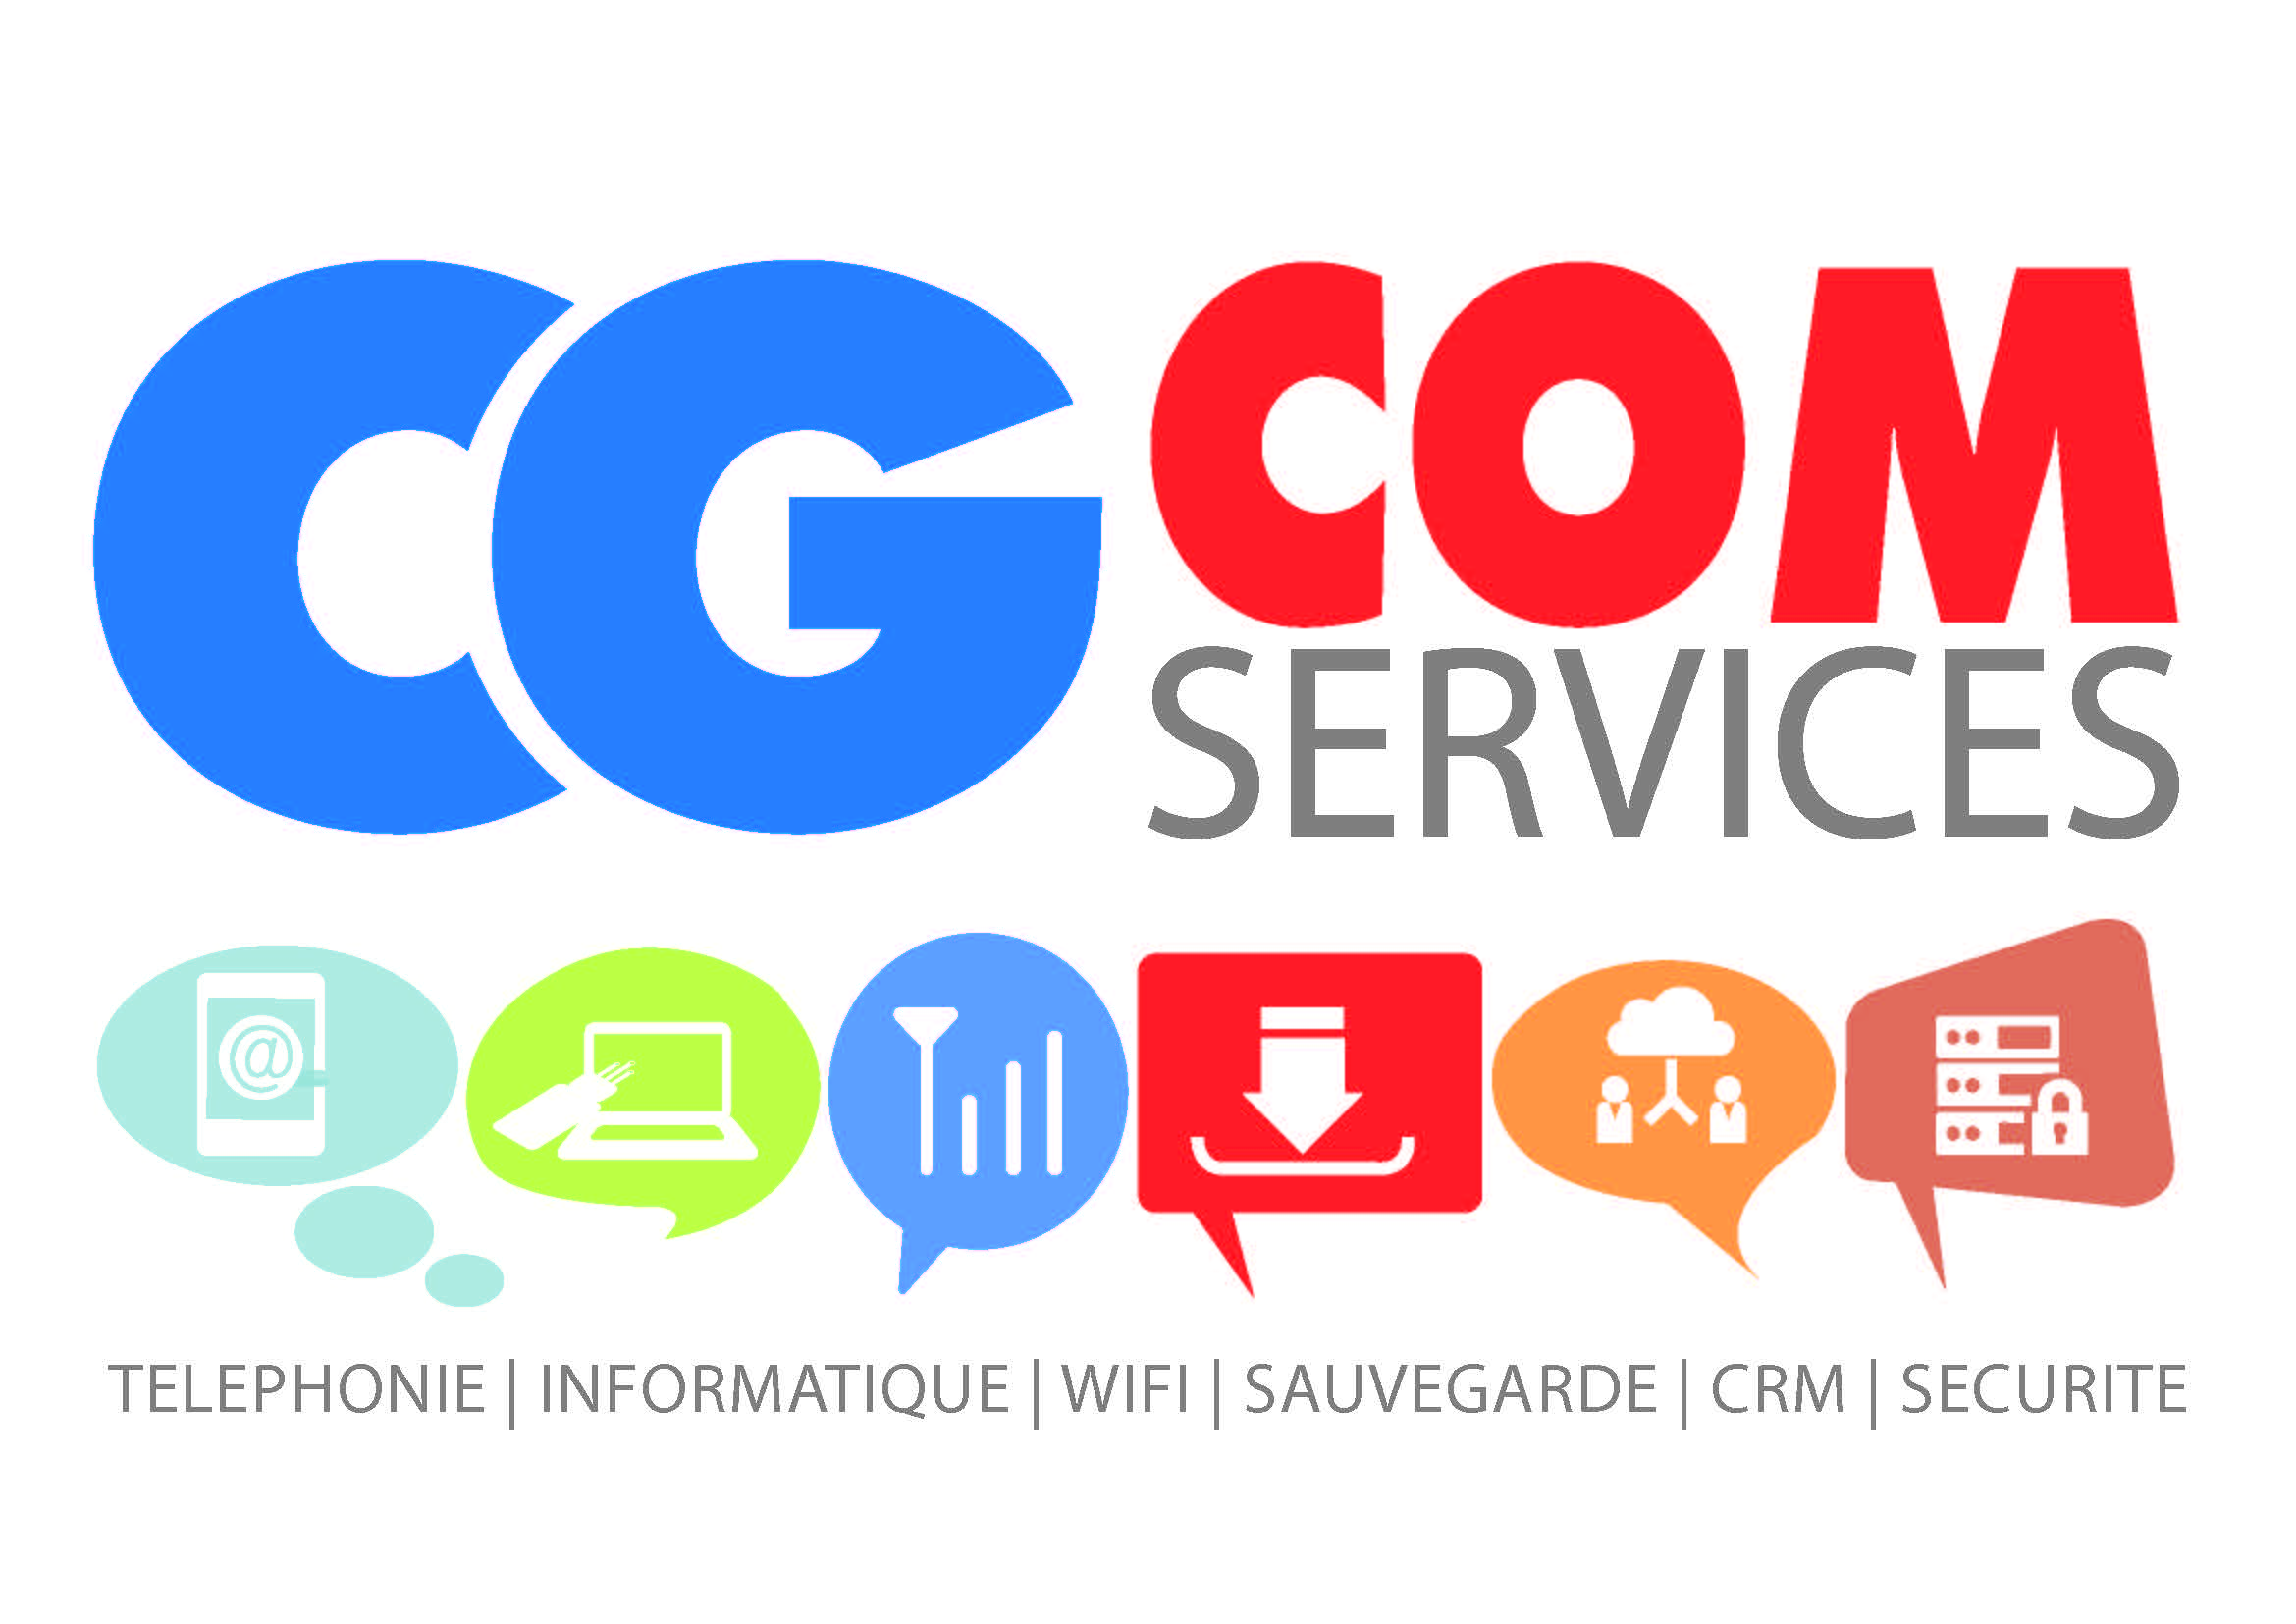 Christophe Gross BNI Lorraine CGCom Services